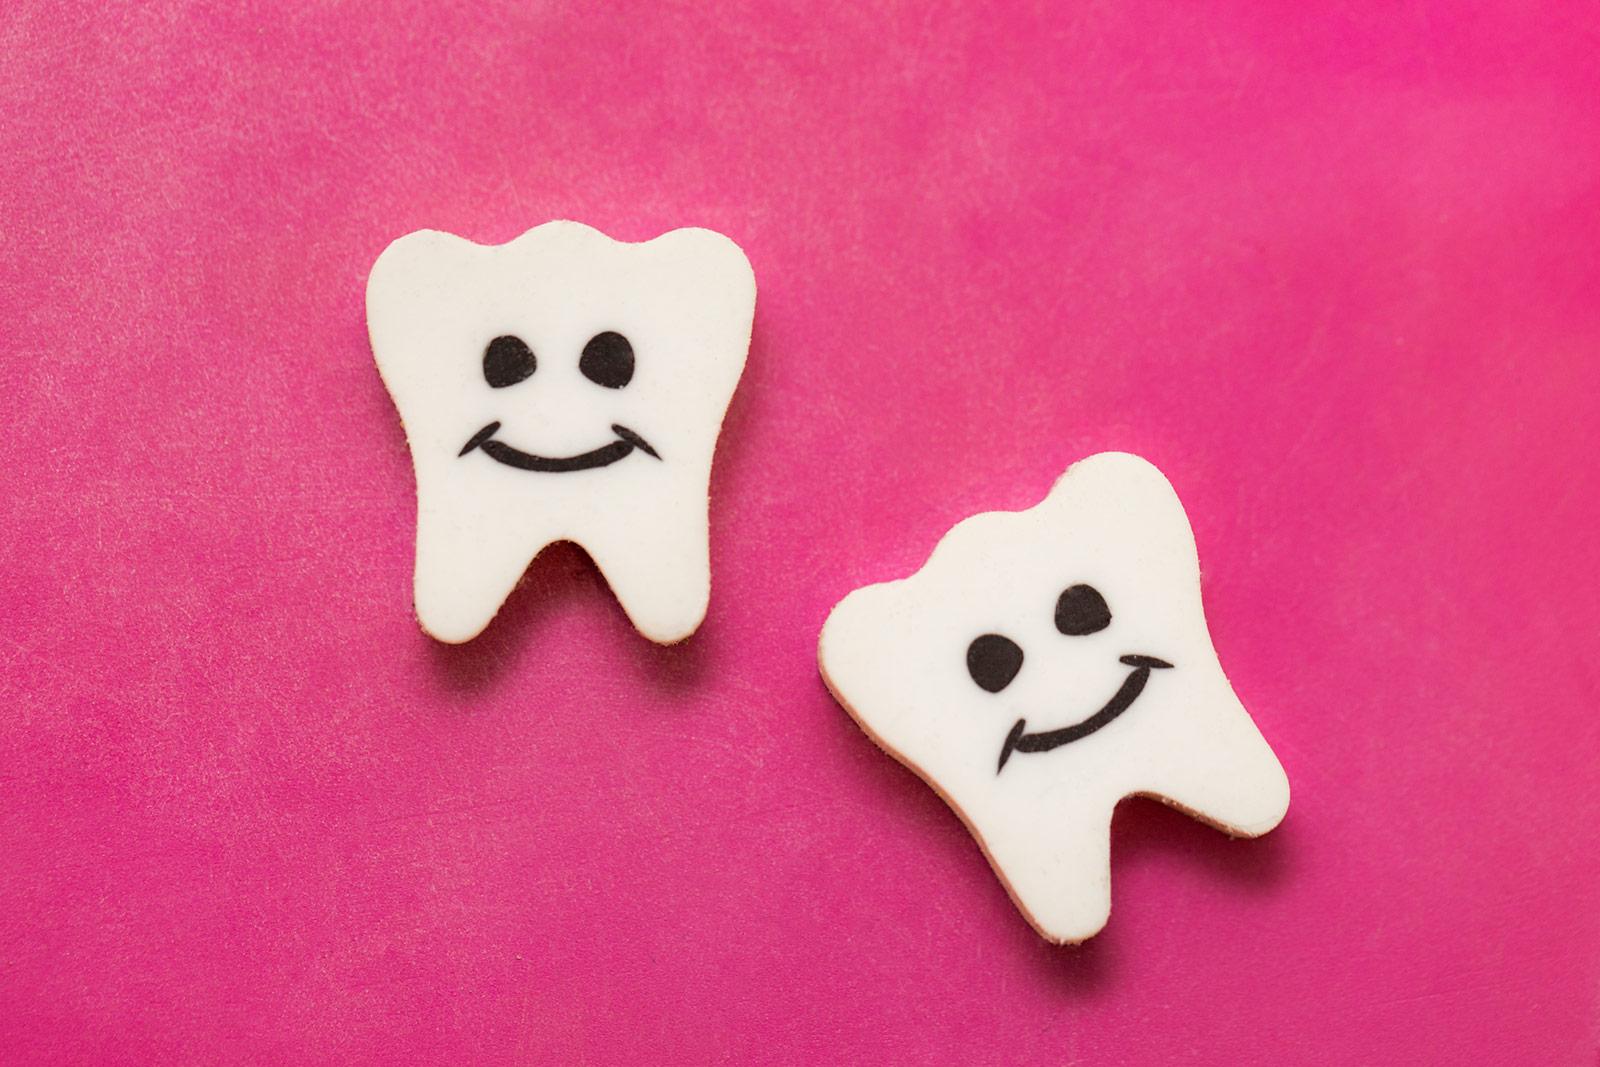 05 businessfotograf arztpraxis zahnarzt praxis welldent medical - Businessfotografie in der Zahnarztpraxis